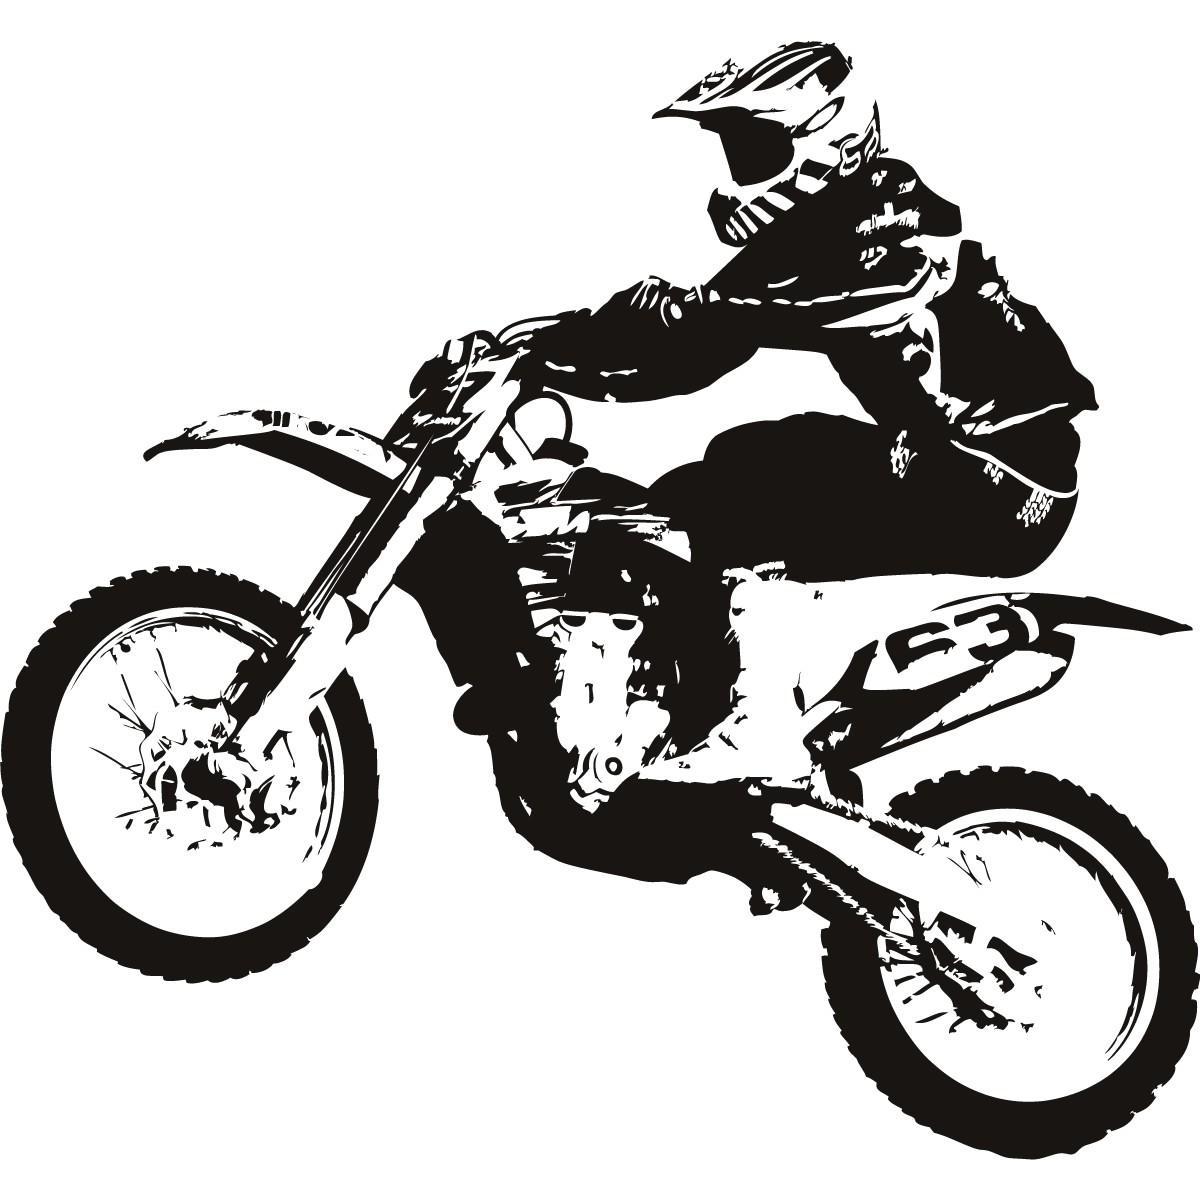 Yamaha clipart motocross Clipart Pinterest Motocross Clipart Motocross